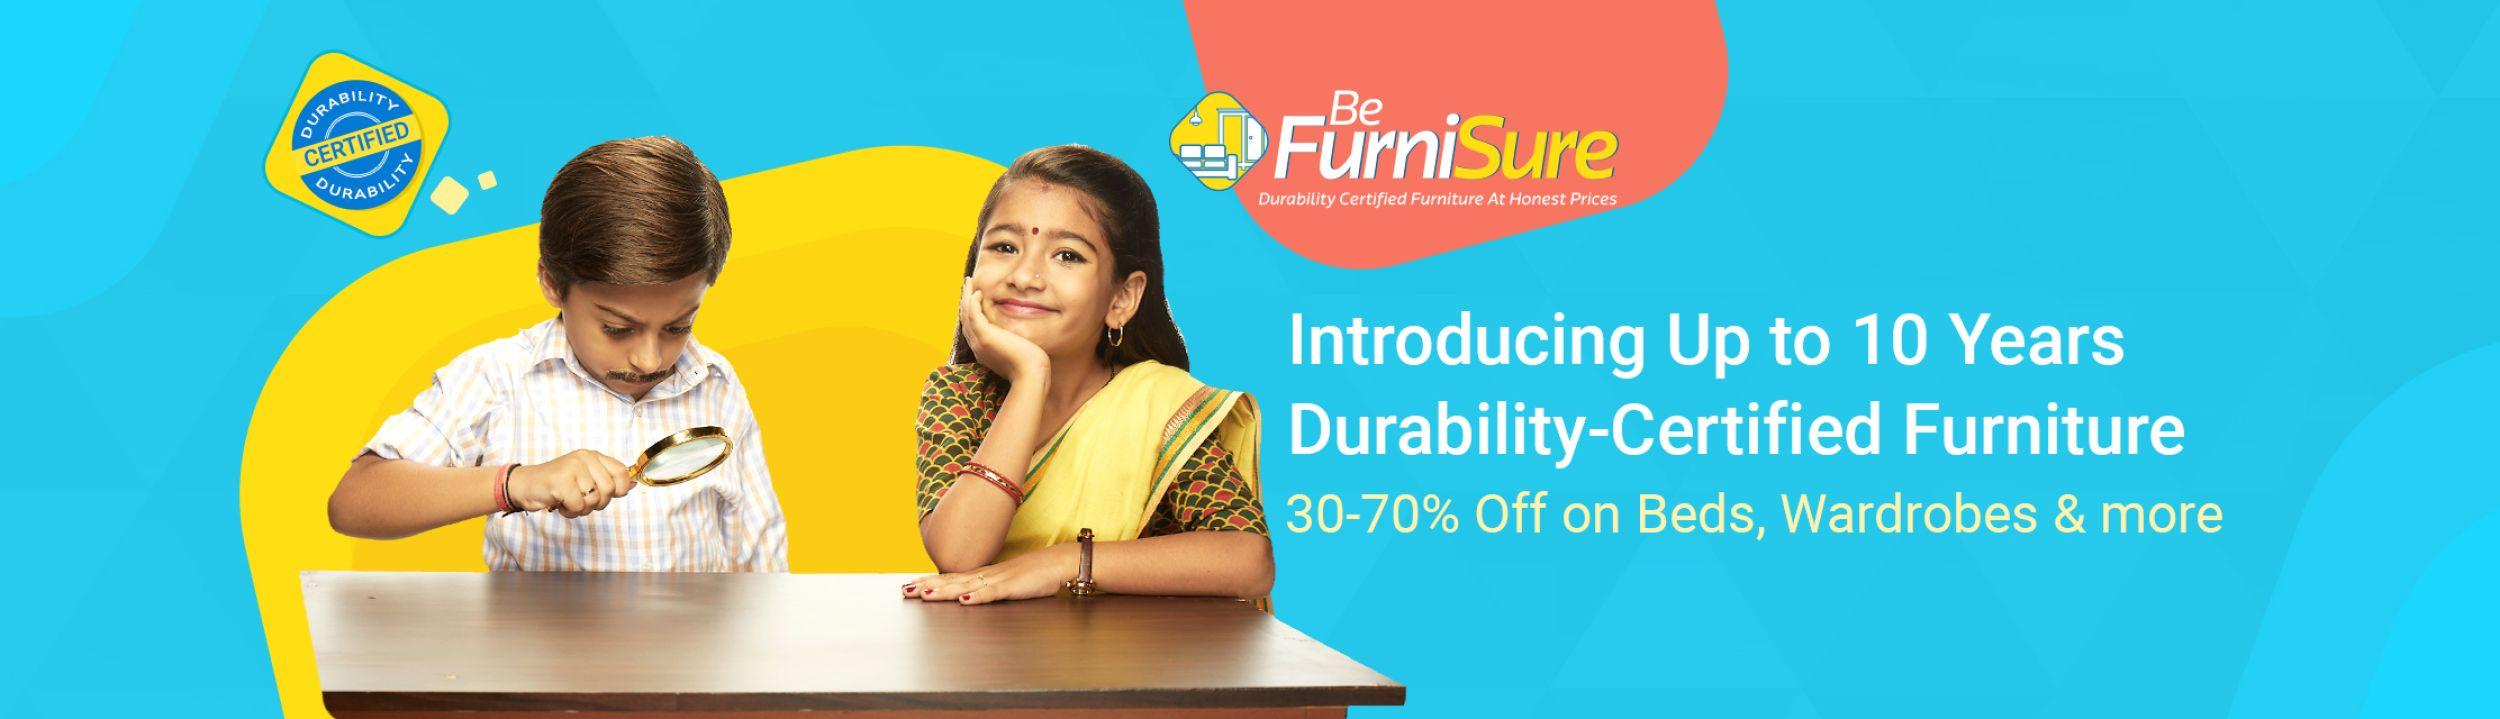 49ed4267b61 Furniture (फर्नीचर)  Buy Wooden Furniture Online at Flipkart ...